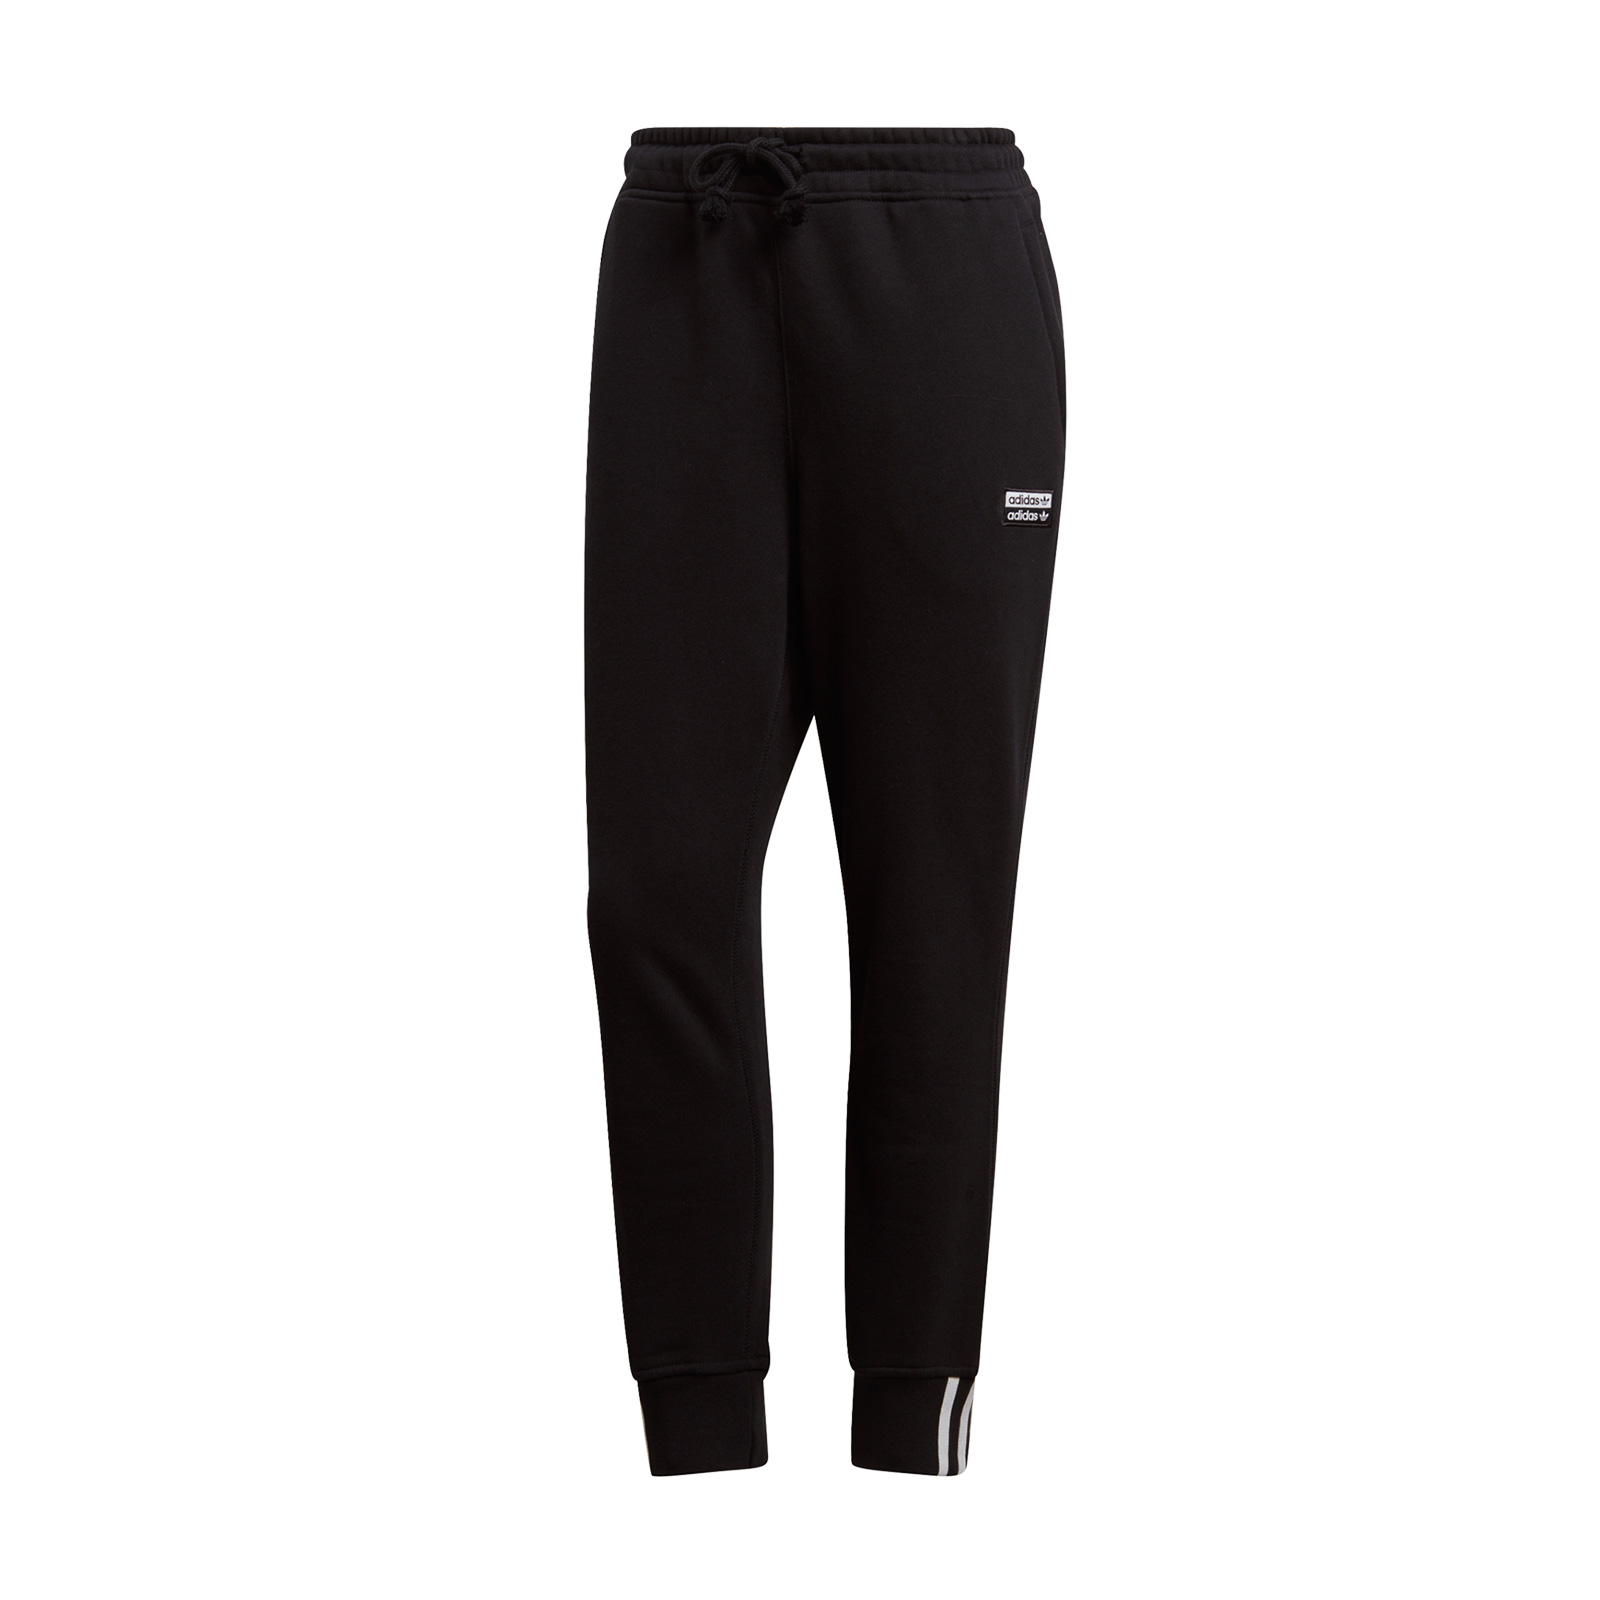 adidas Originals - PANT - BLACK